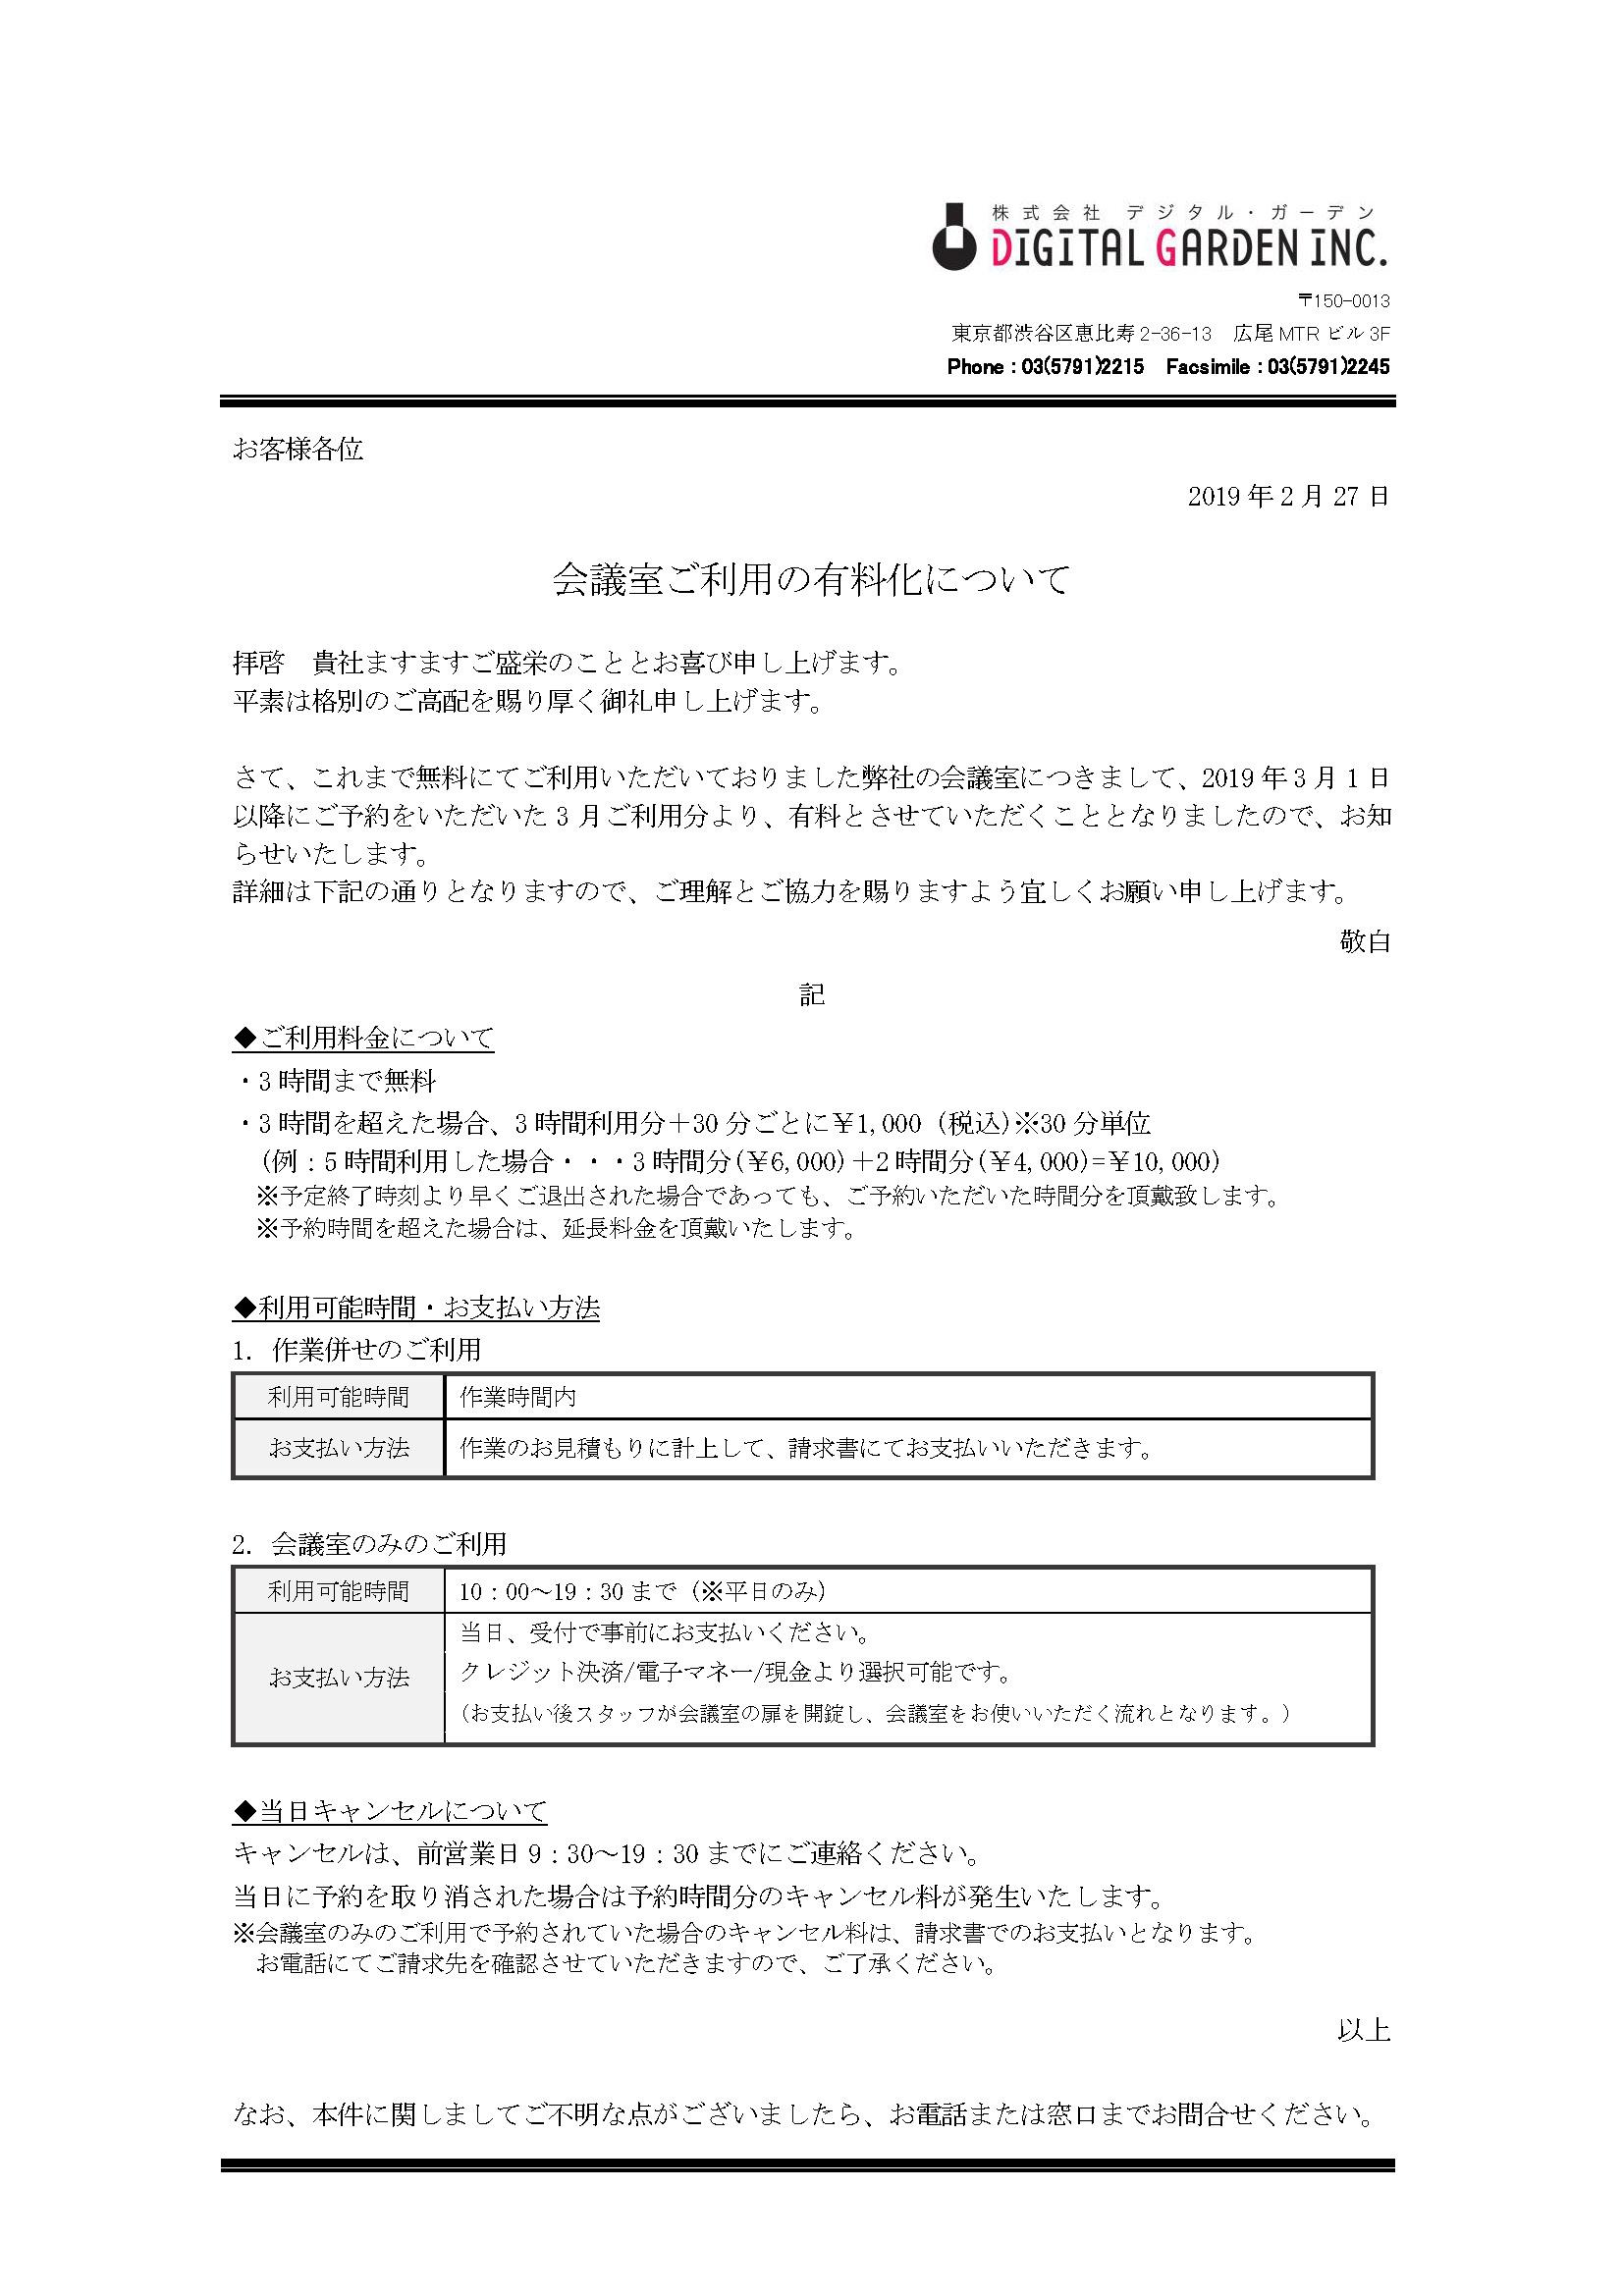 【HP+受付掲示用】会議室の有料化について (1)